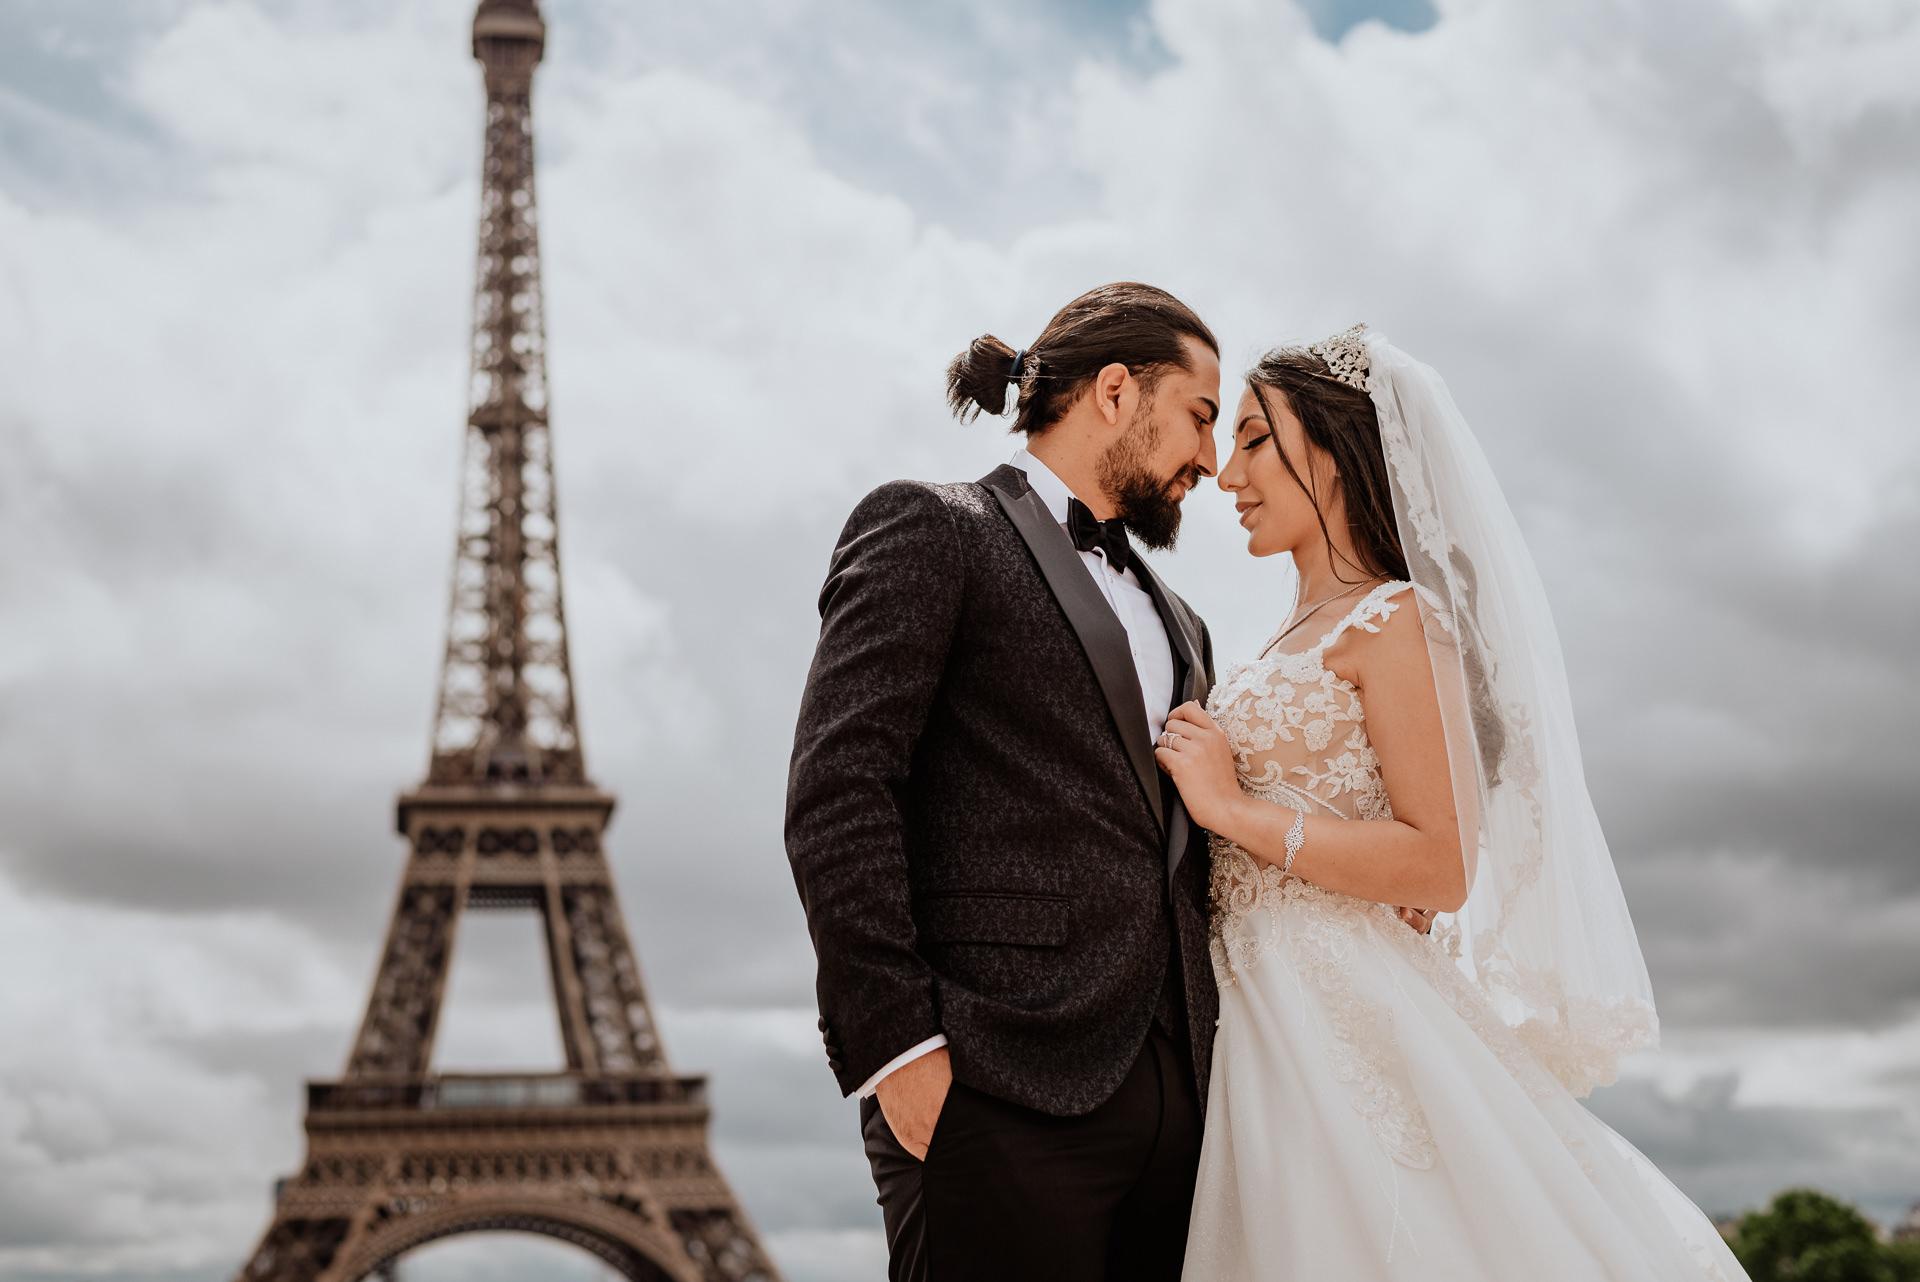 paris wedding proposal photoshoot